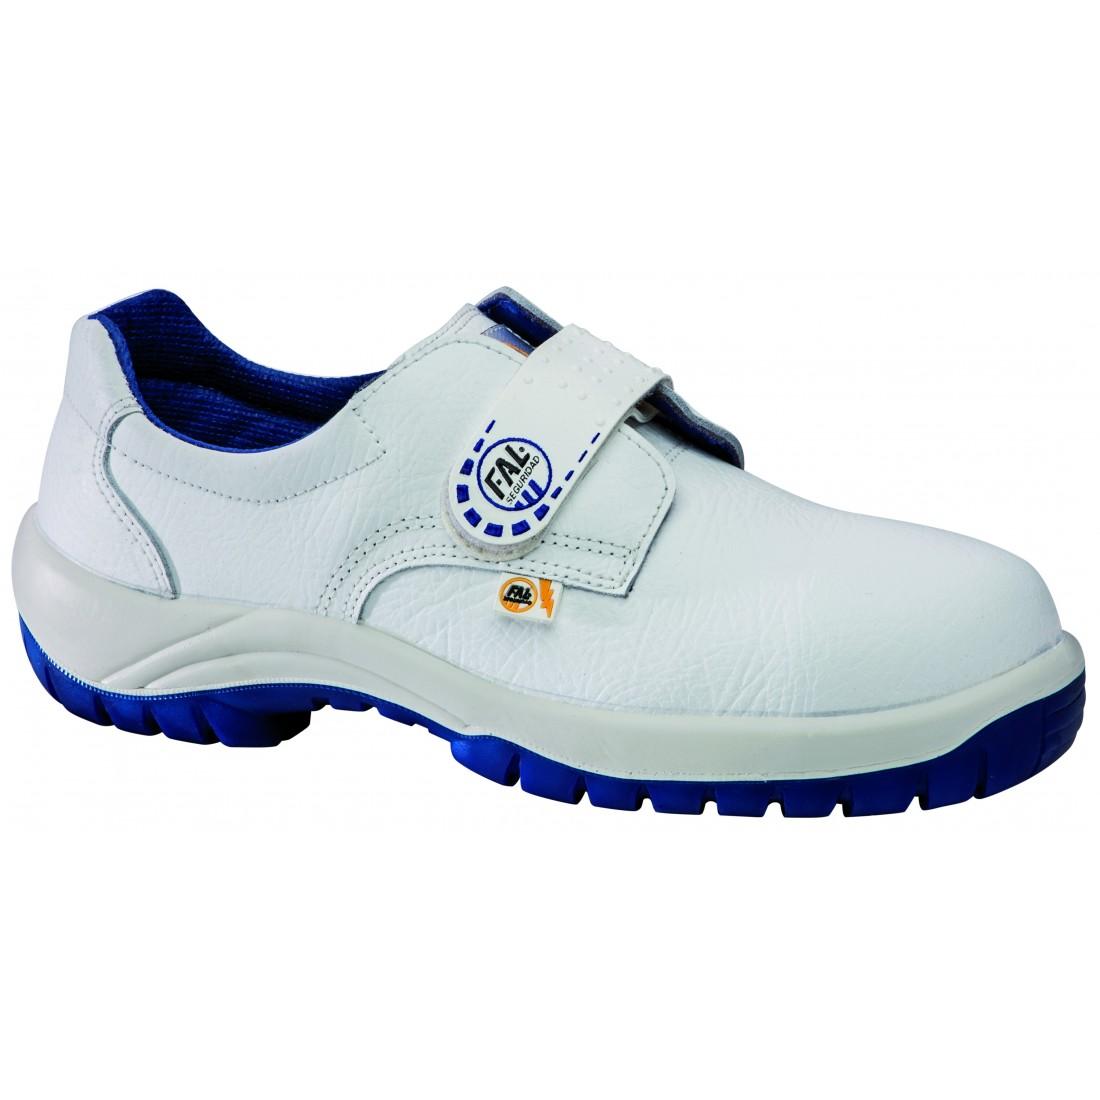 Zapato de seguridad blanco modelo Omega